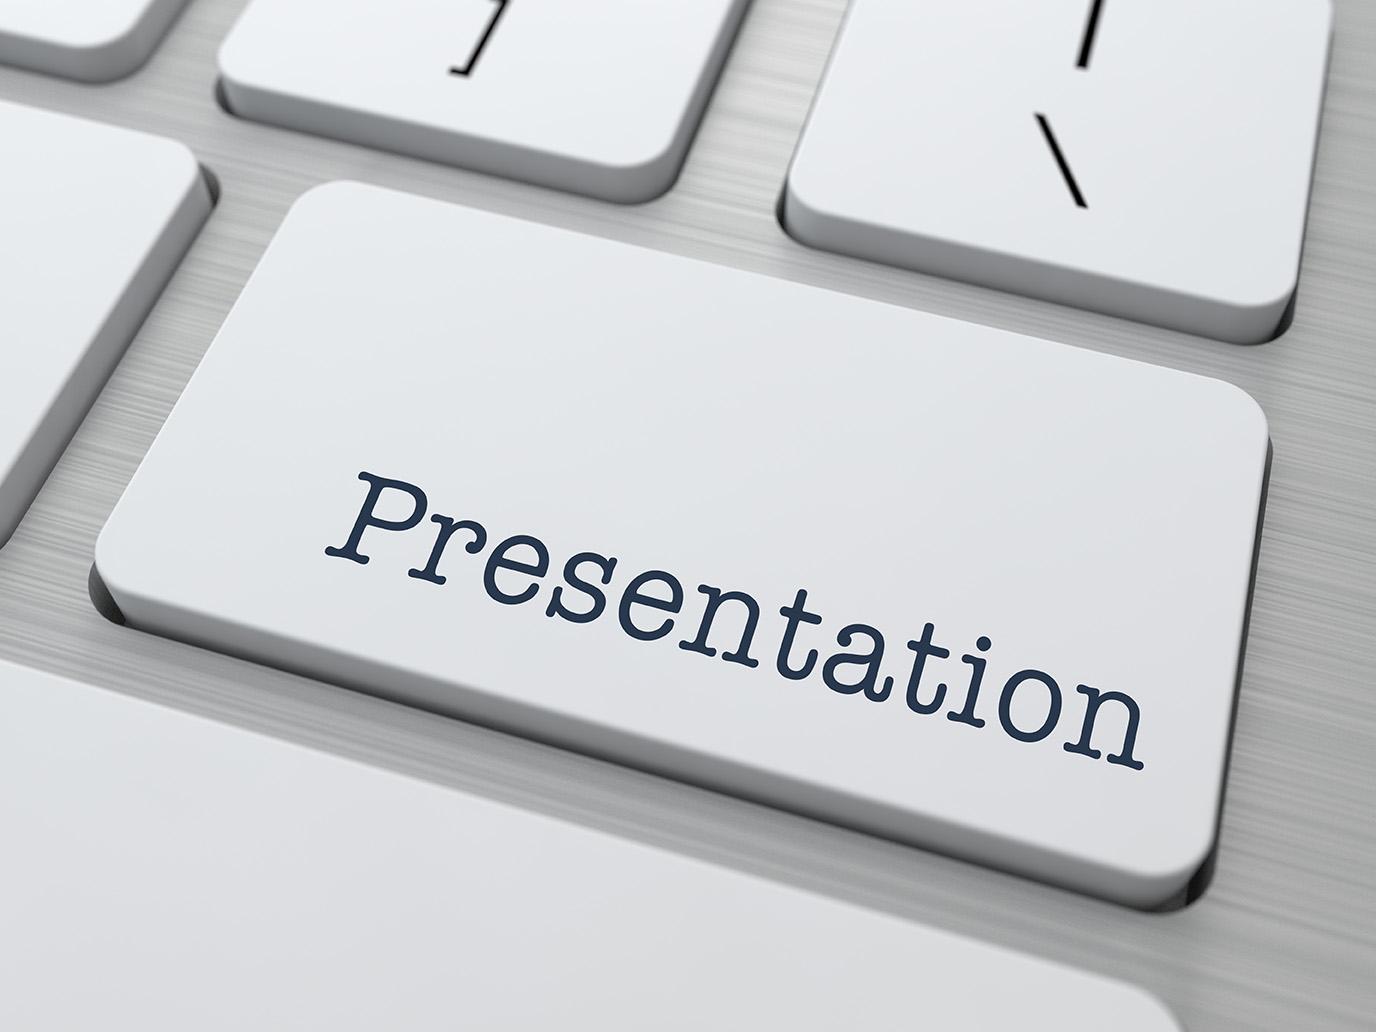 Presentation of the First Quarter 2021